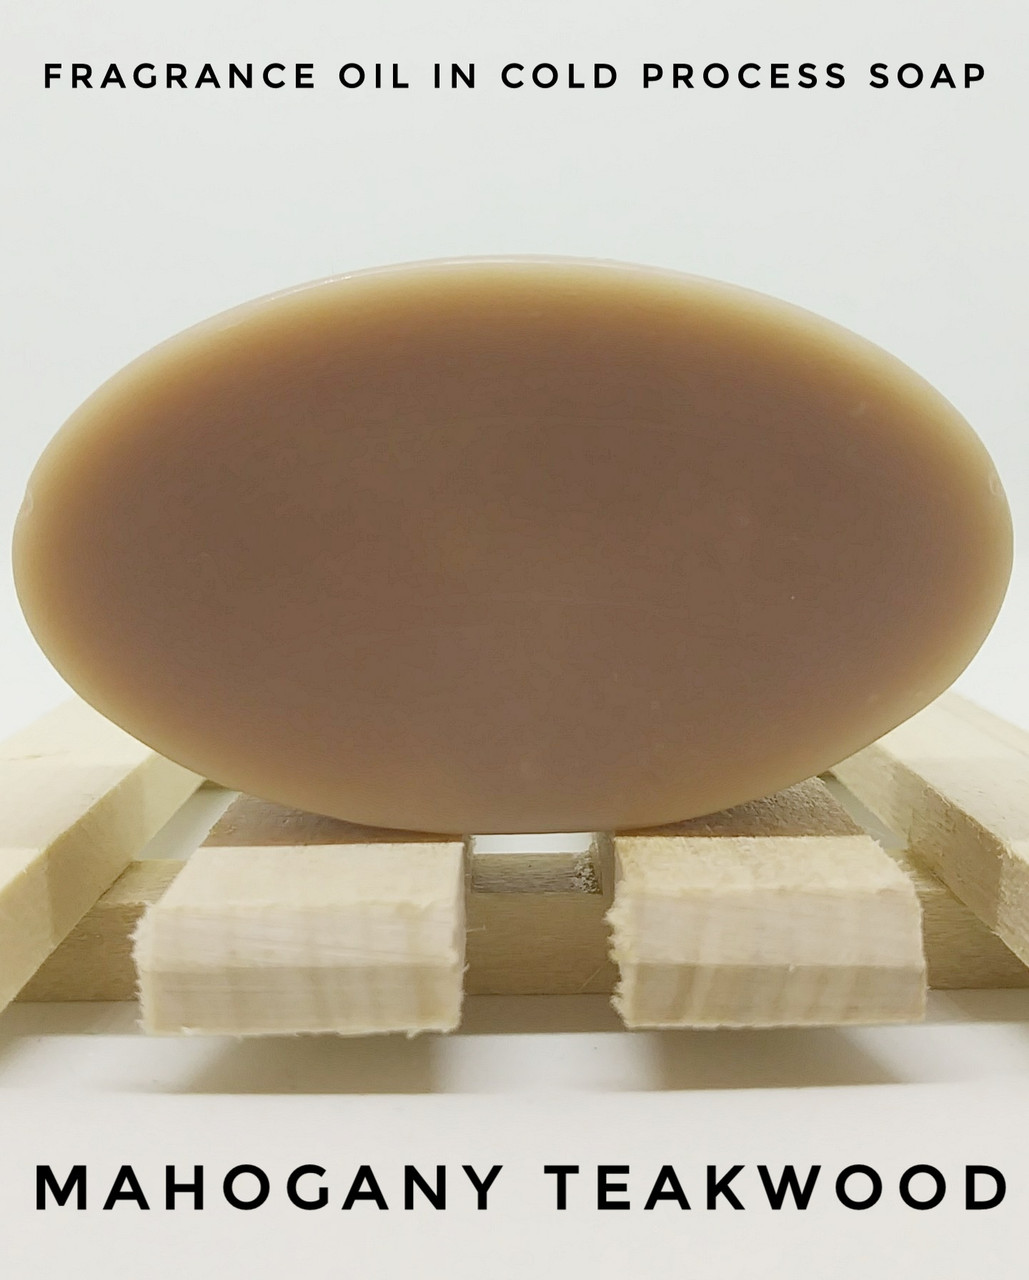 Mahogany Teakwood Type Fragrance Oil